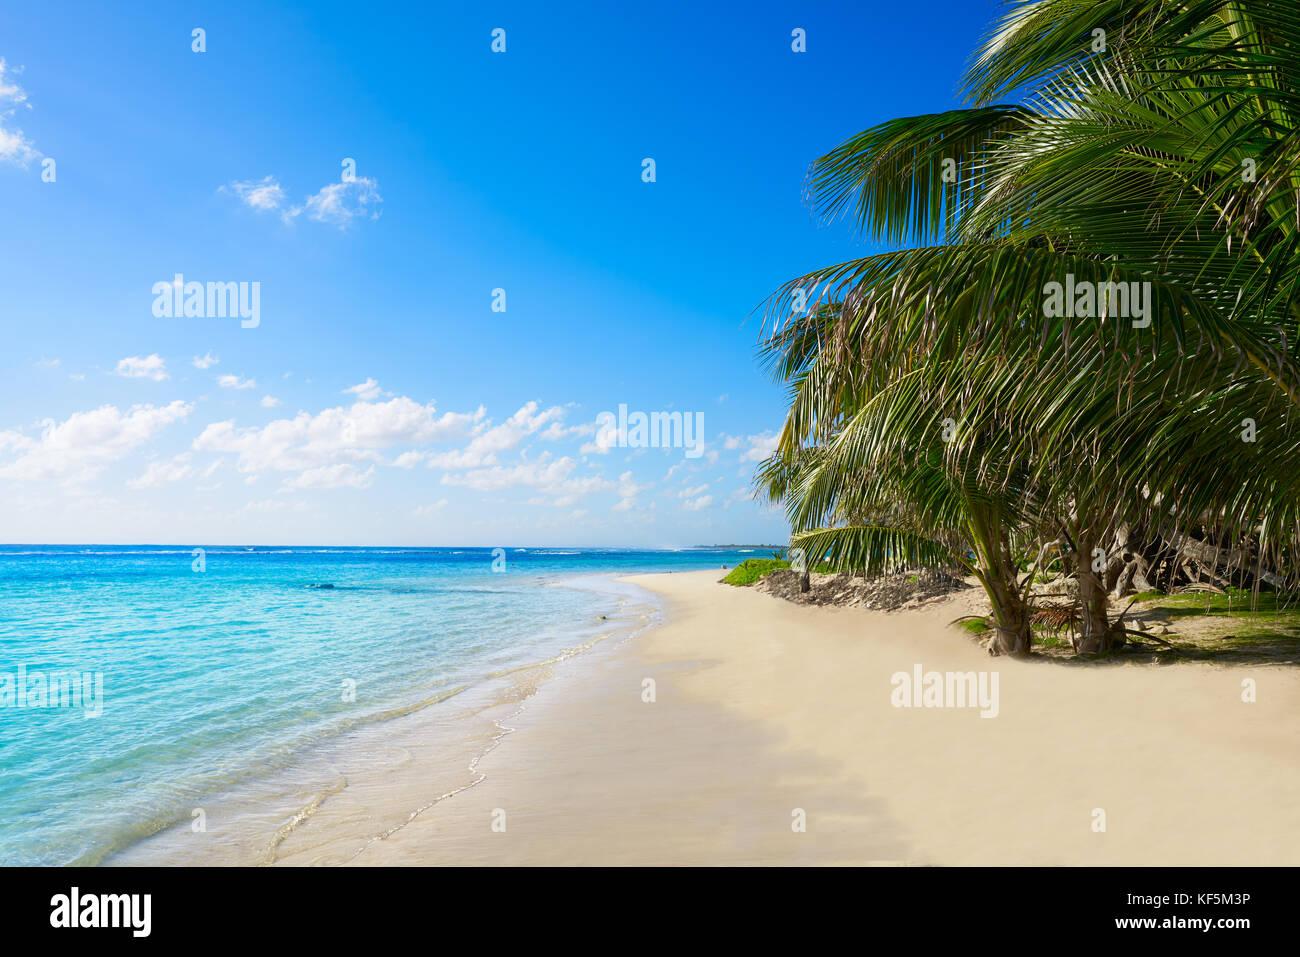 Mahahual Caribbean Beach In Costa Maya Of Mayan Mexico Stock Photo Alamy